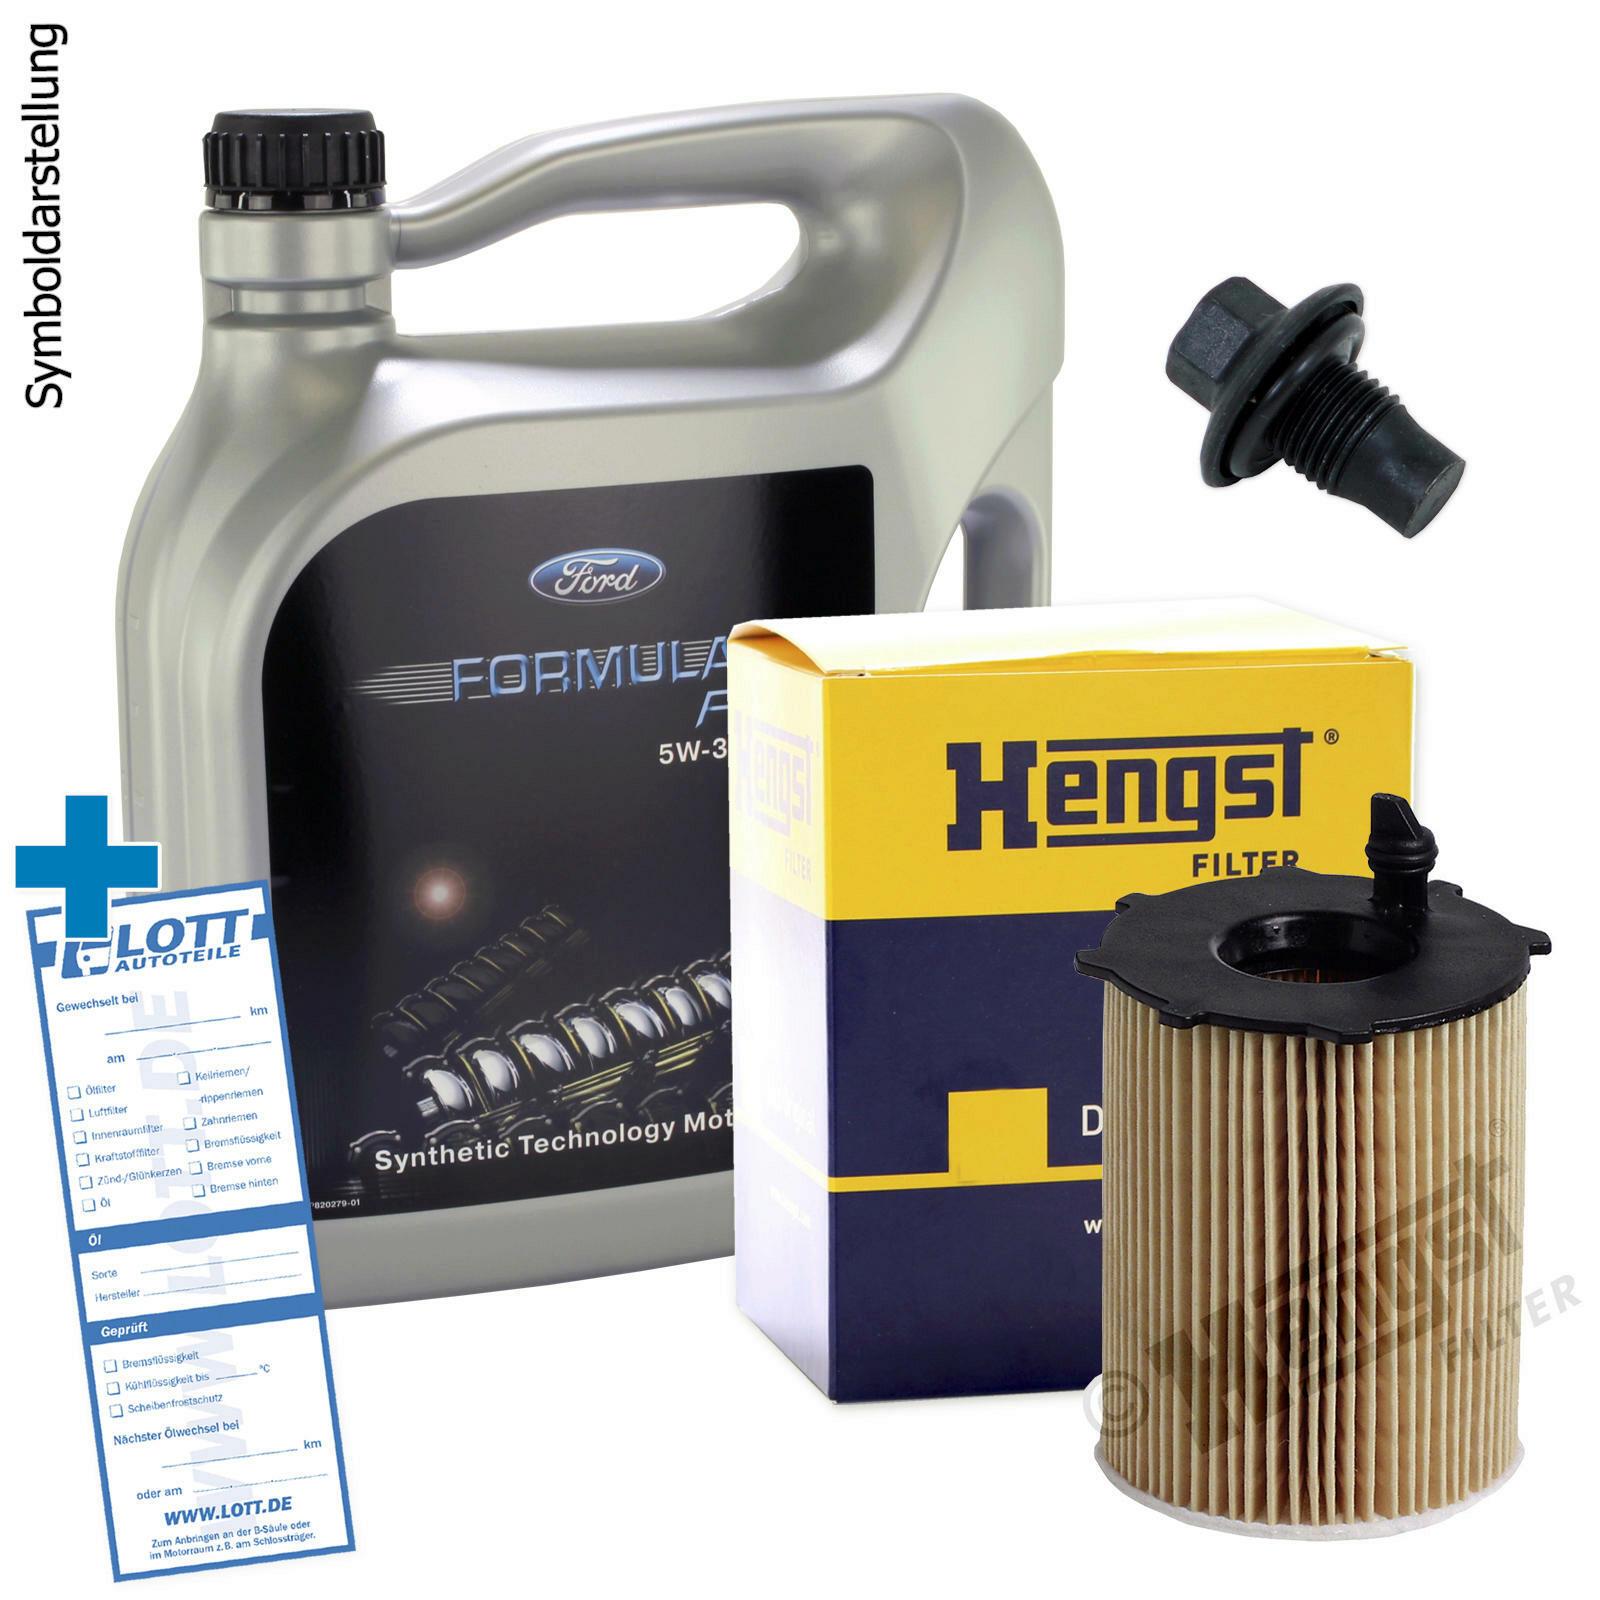 Ölwechsel Set 5L 5W-30 Ford Motoröl + Hengst Ölfilter + Ablassschraube